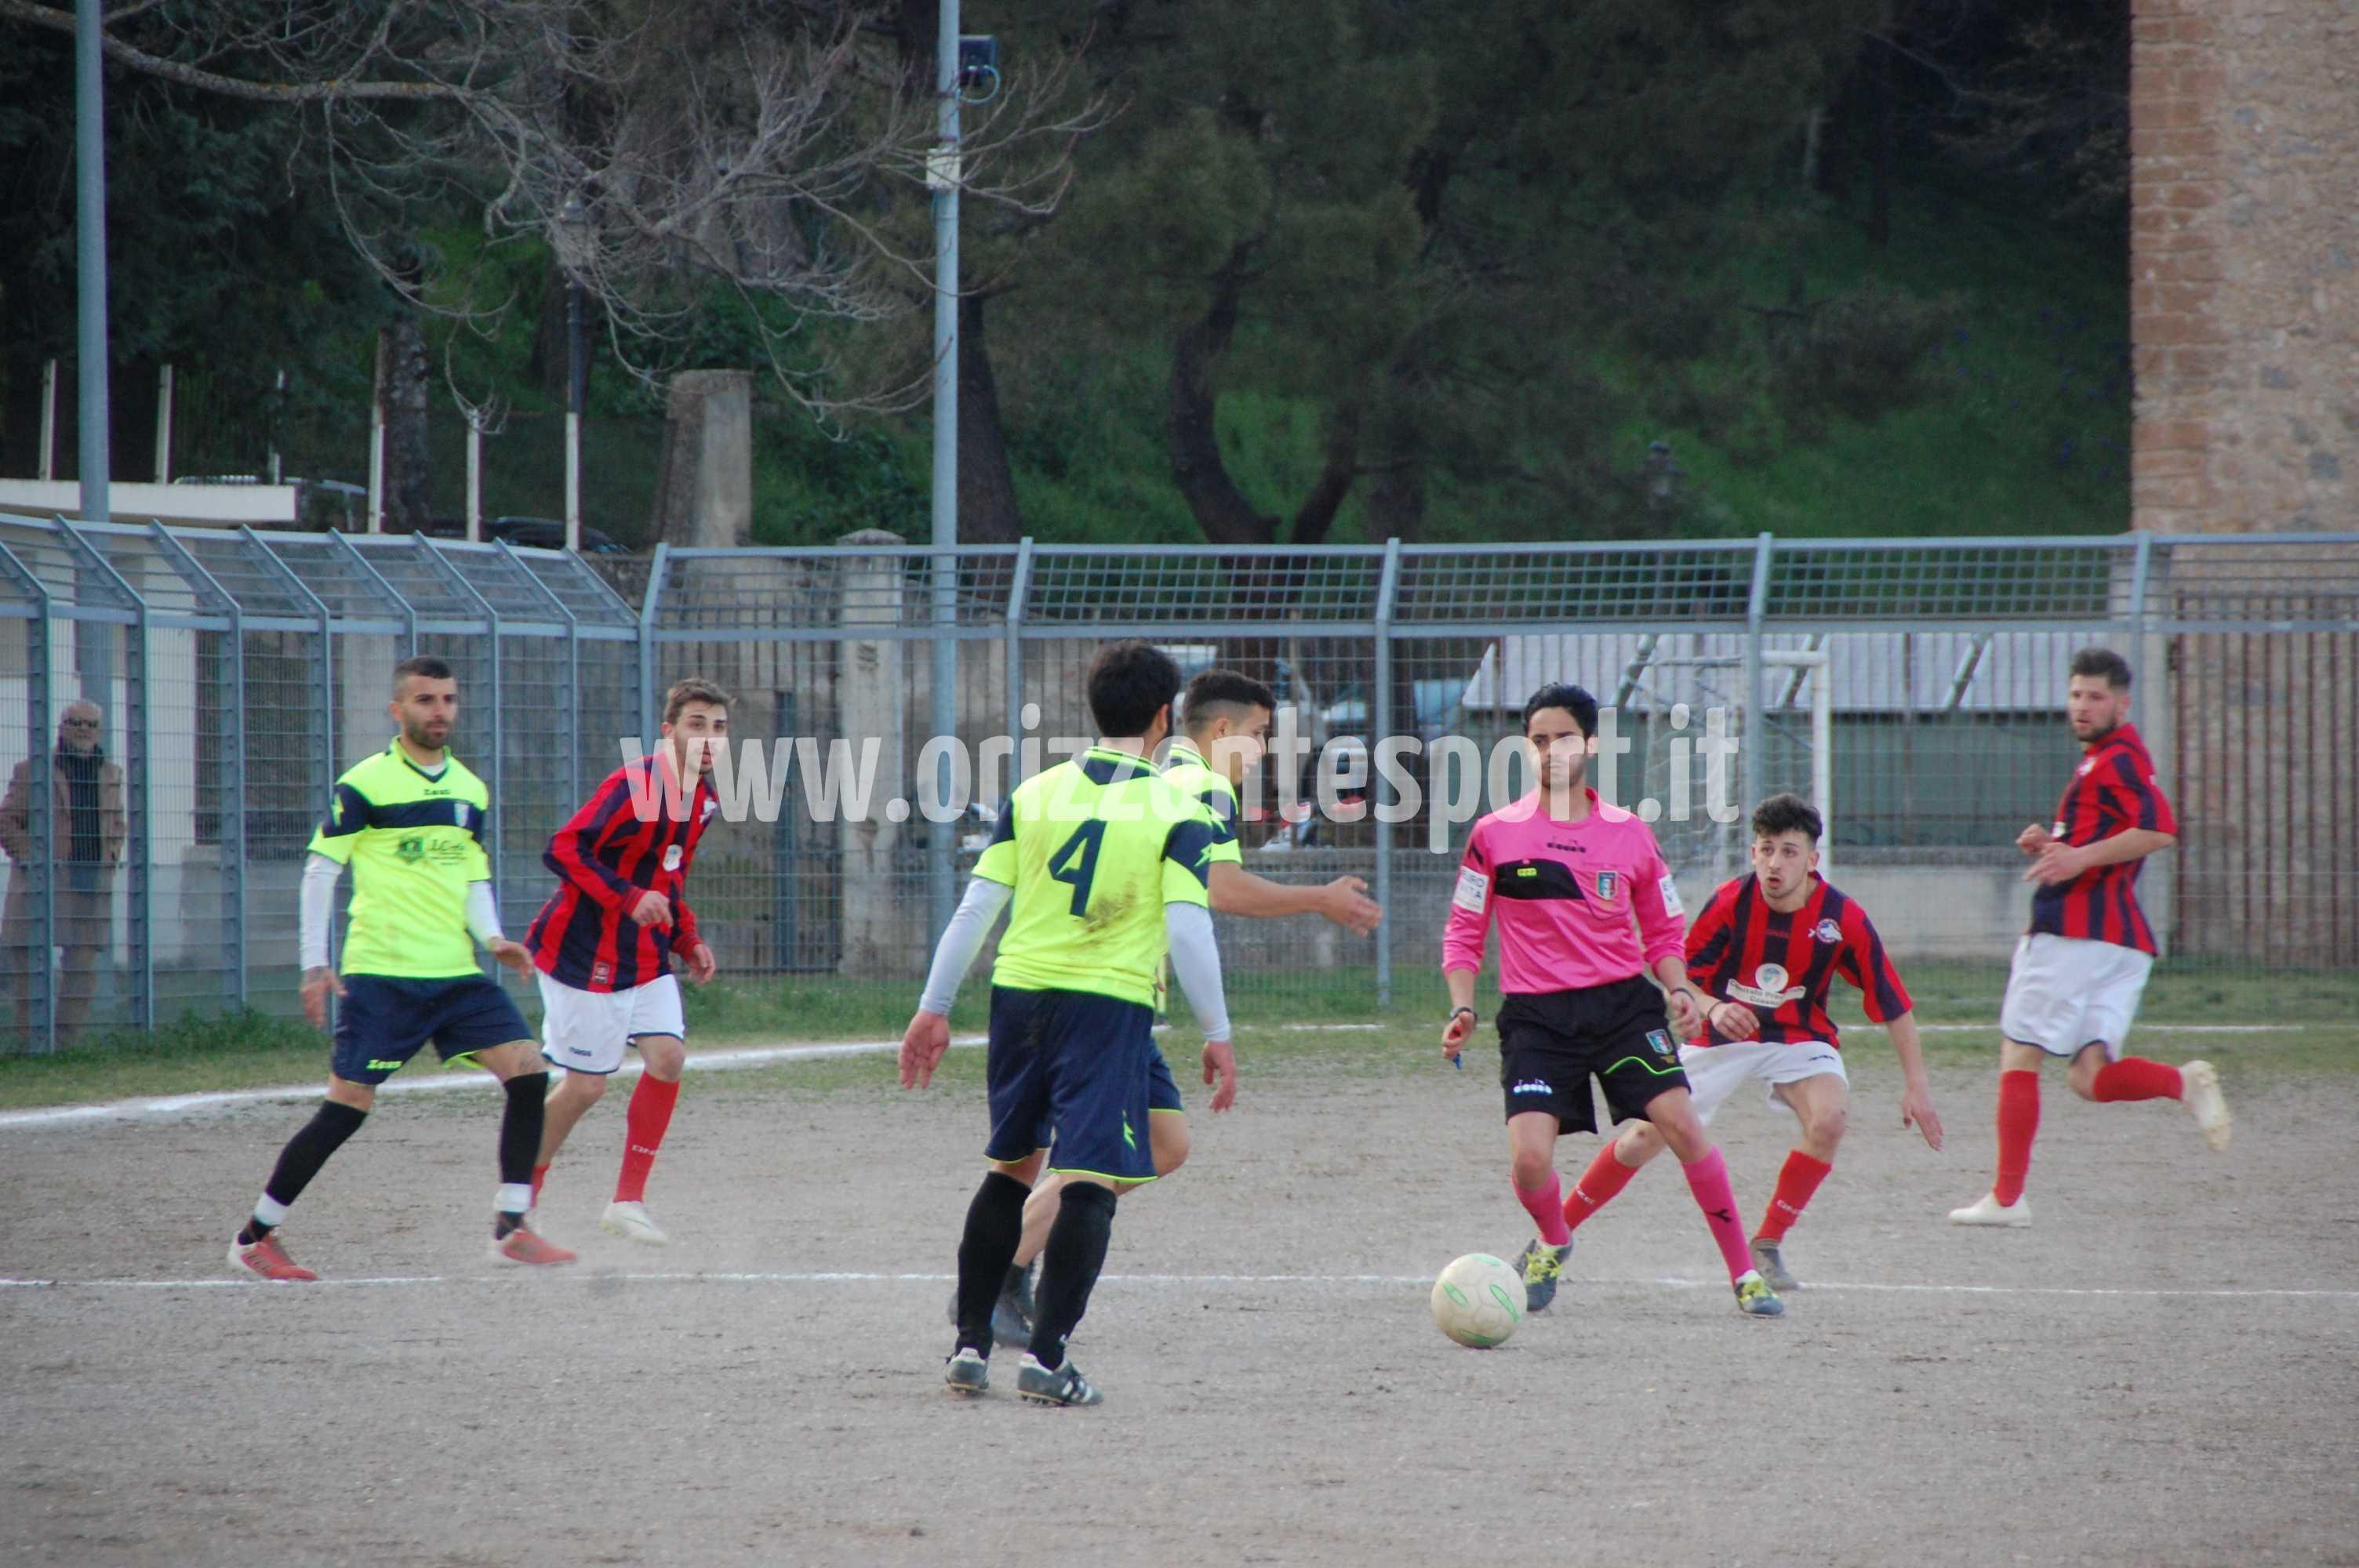 gnettimorano_praiatortora (109)